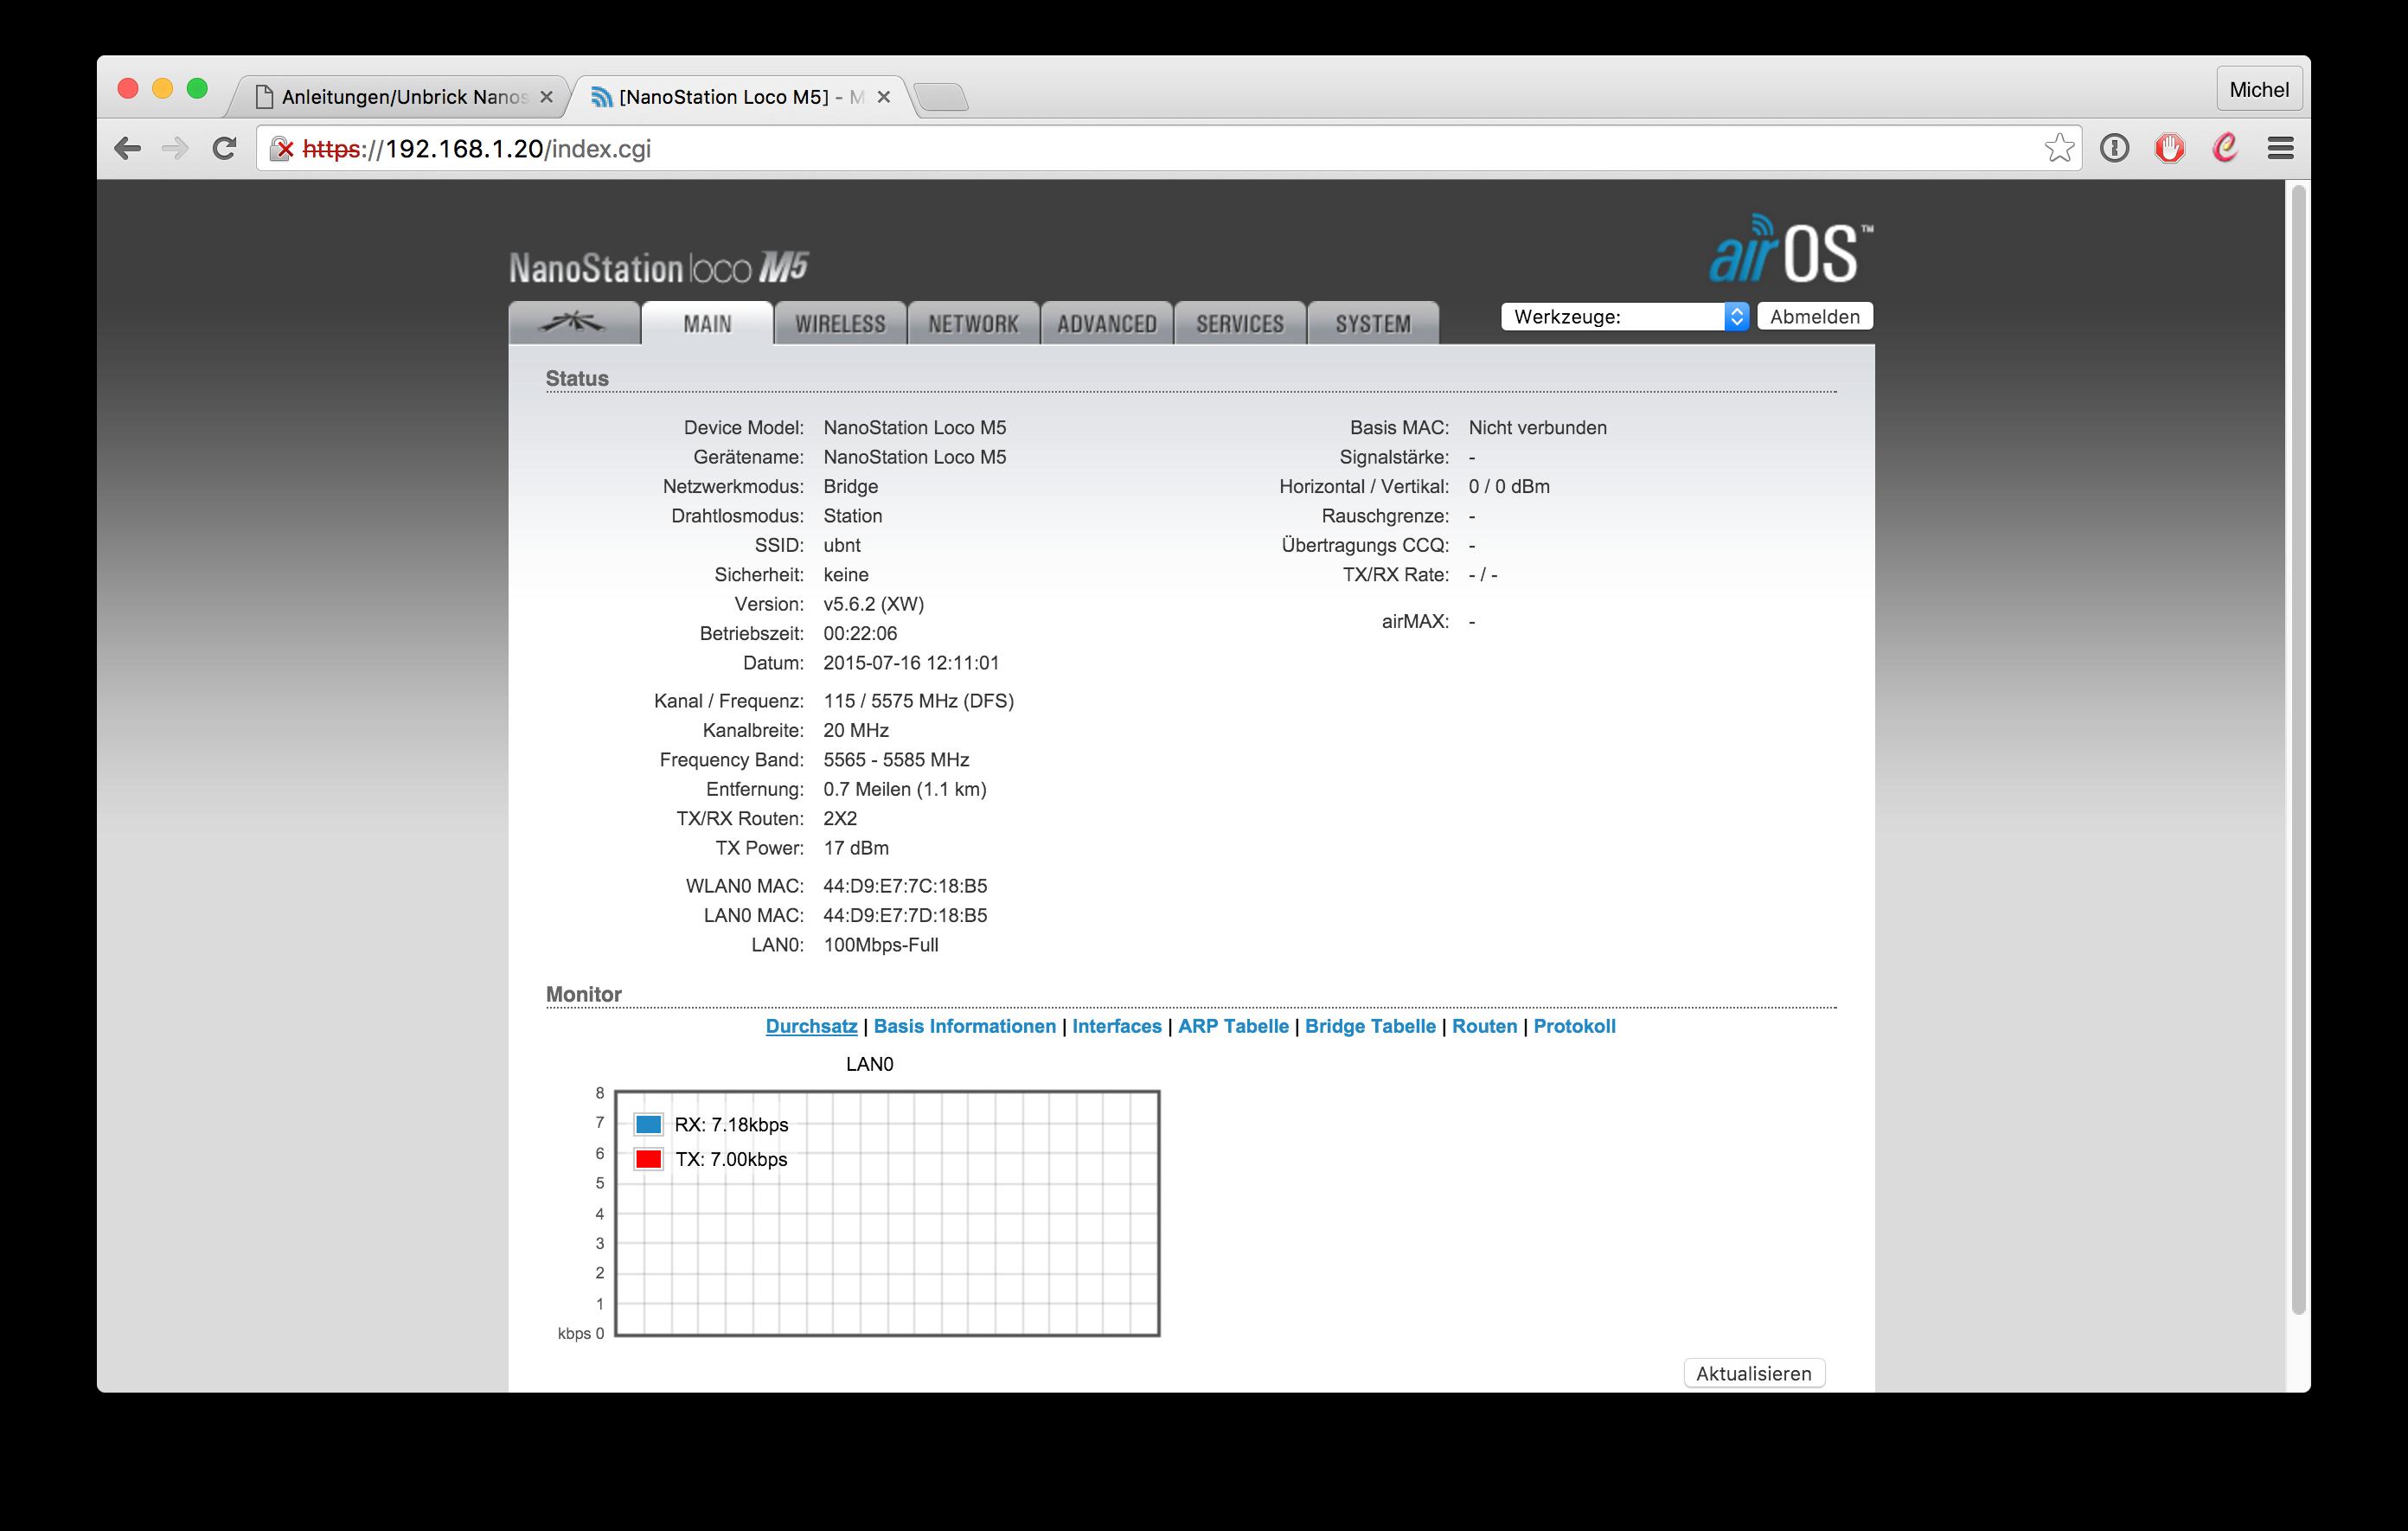 firmware ubiquiti 5.6.3 xw download